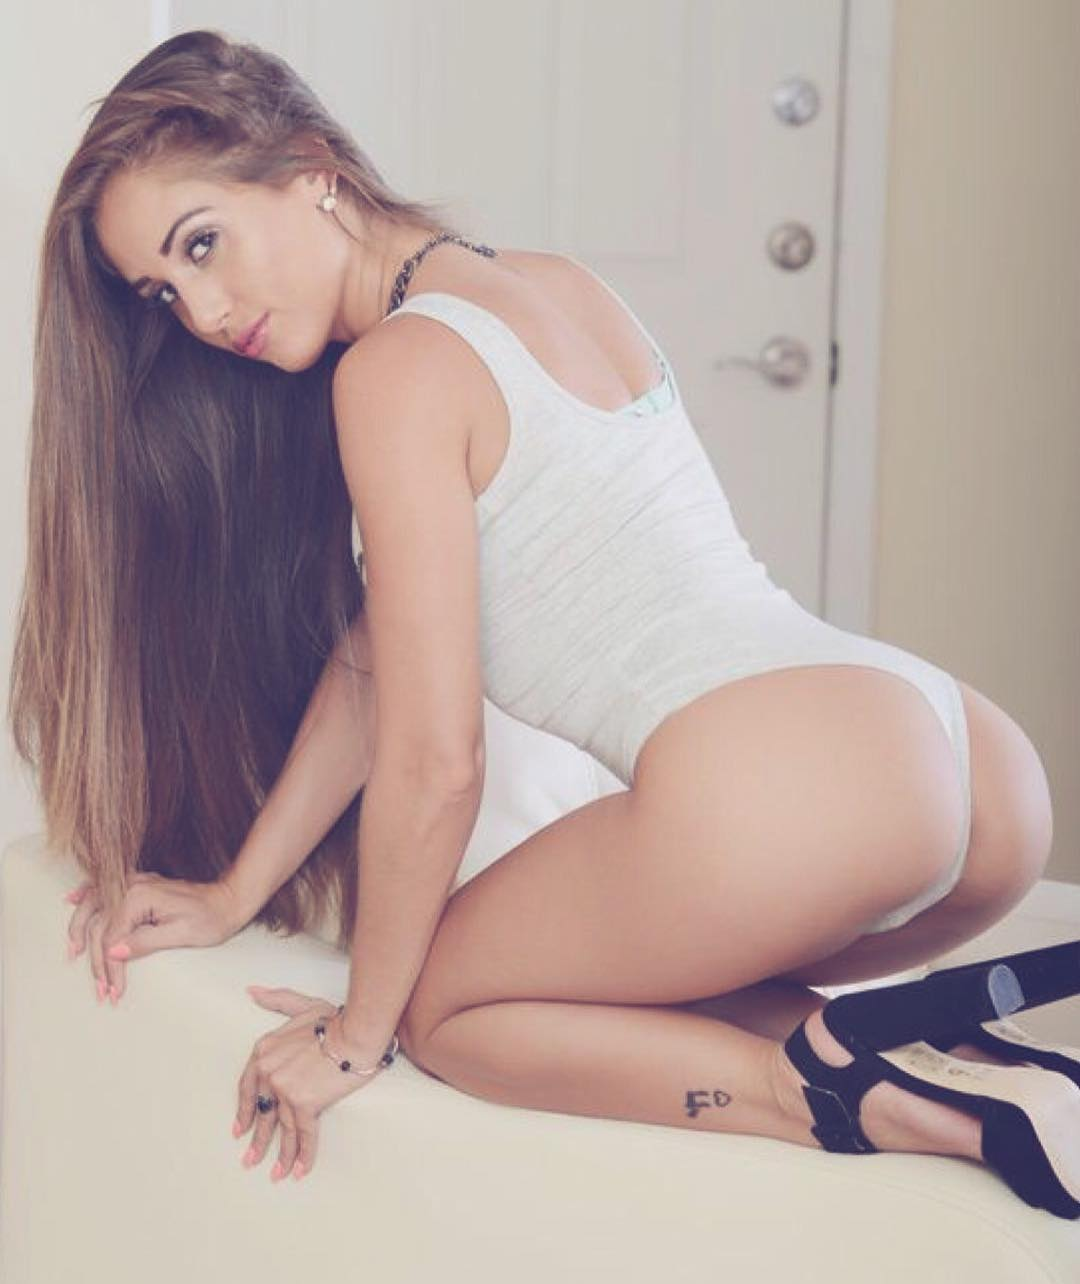 Video Melissa Lori nude photos 2019